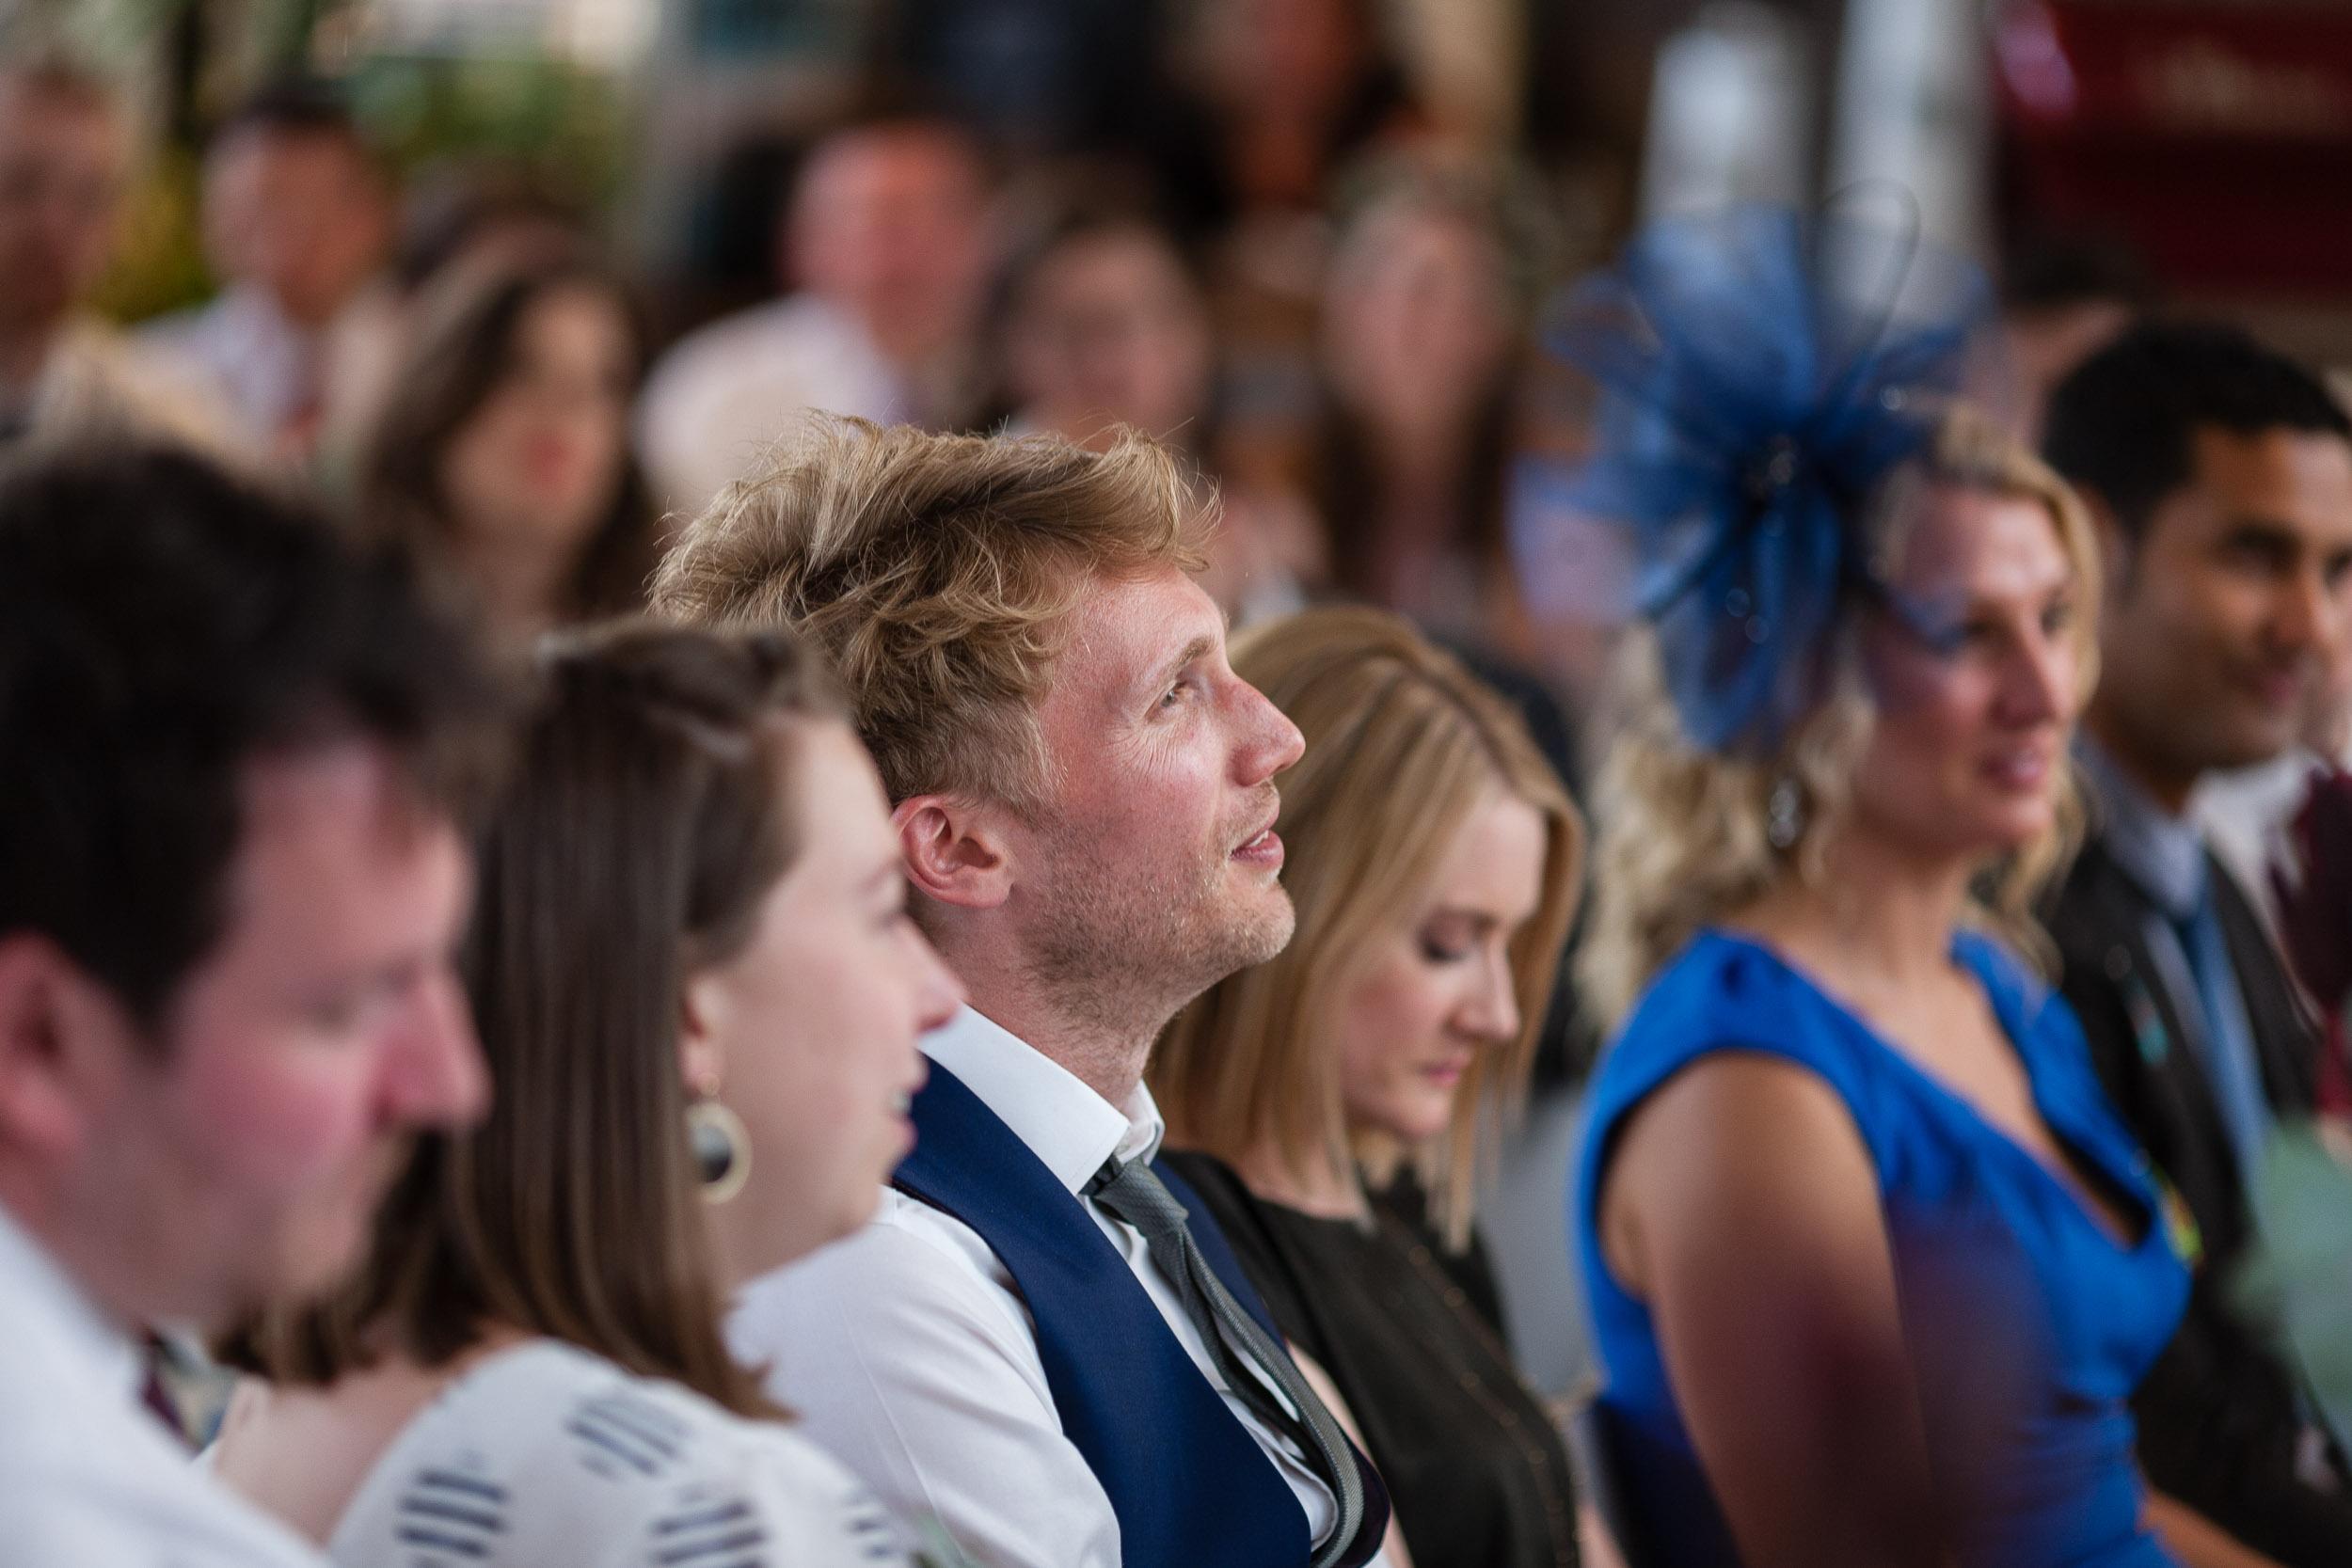 brockwell-lido-brixton-herne-hill-wedding-349.jpg